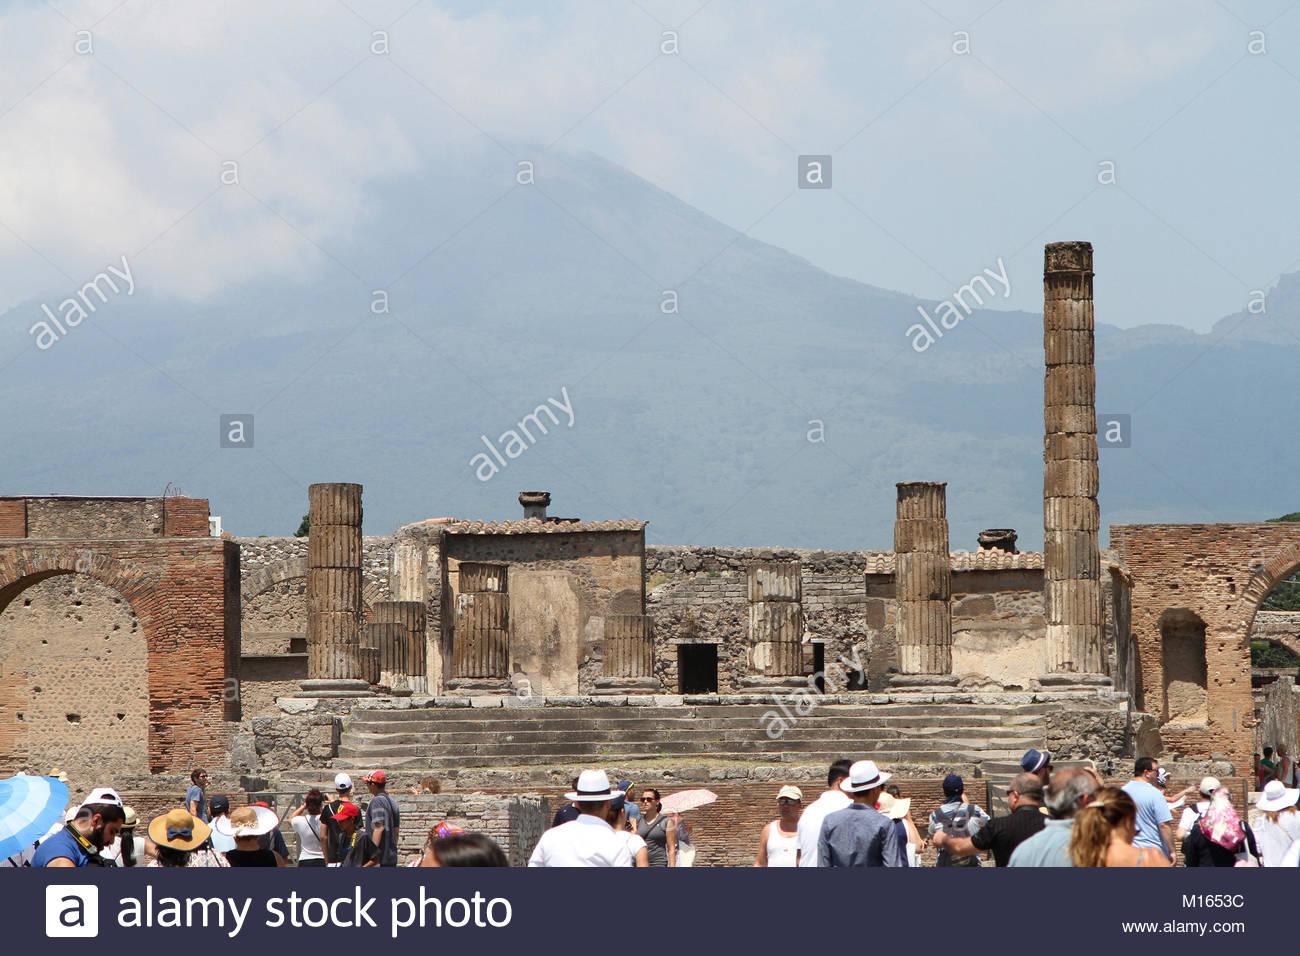 Temple of Jupiter with Mount Vesuvius in the background Pompeii 1300x956